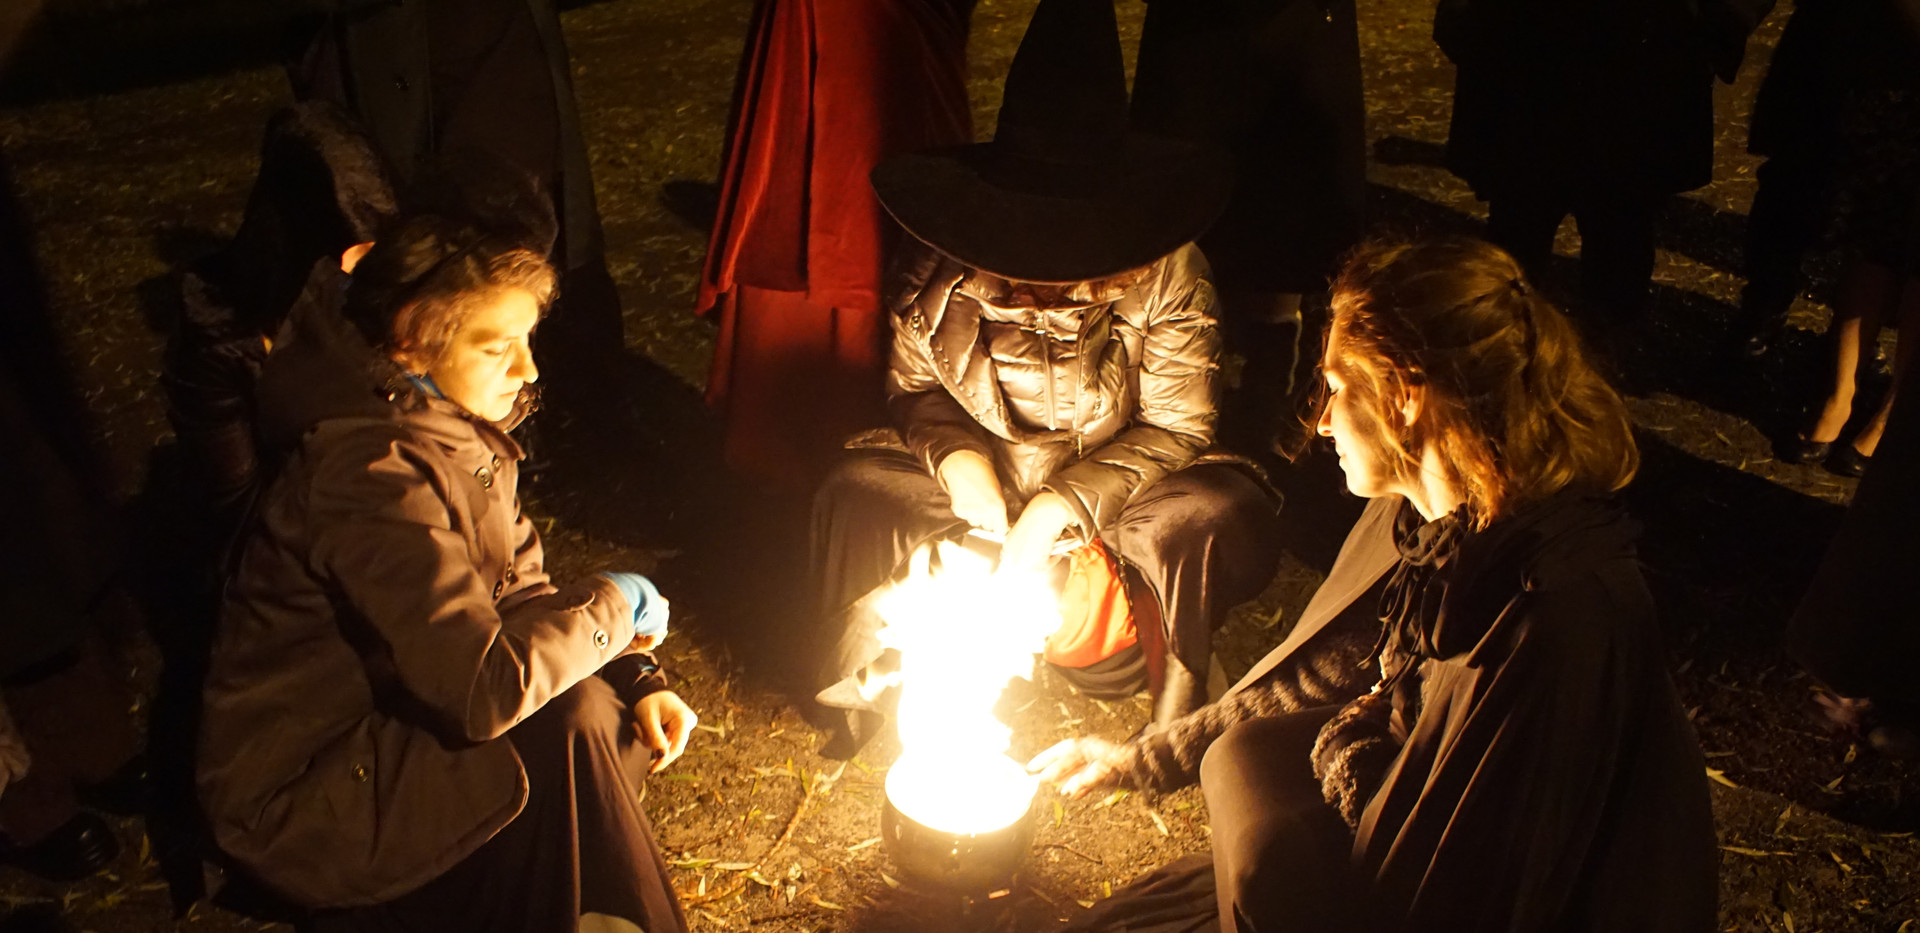 Le feu du rituel